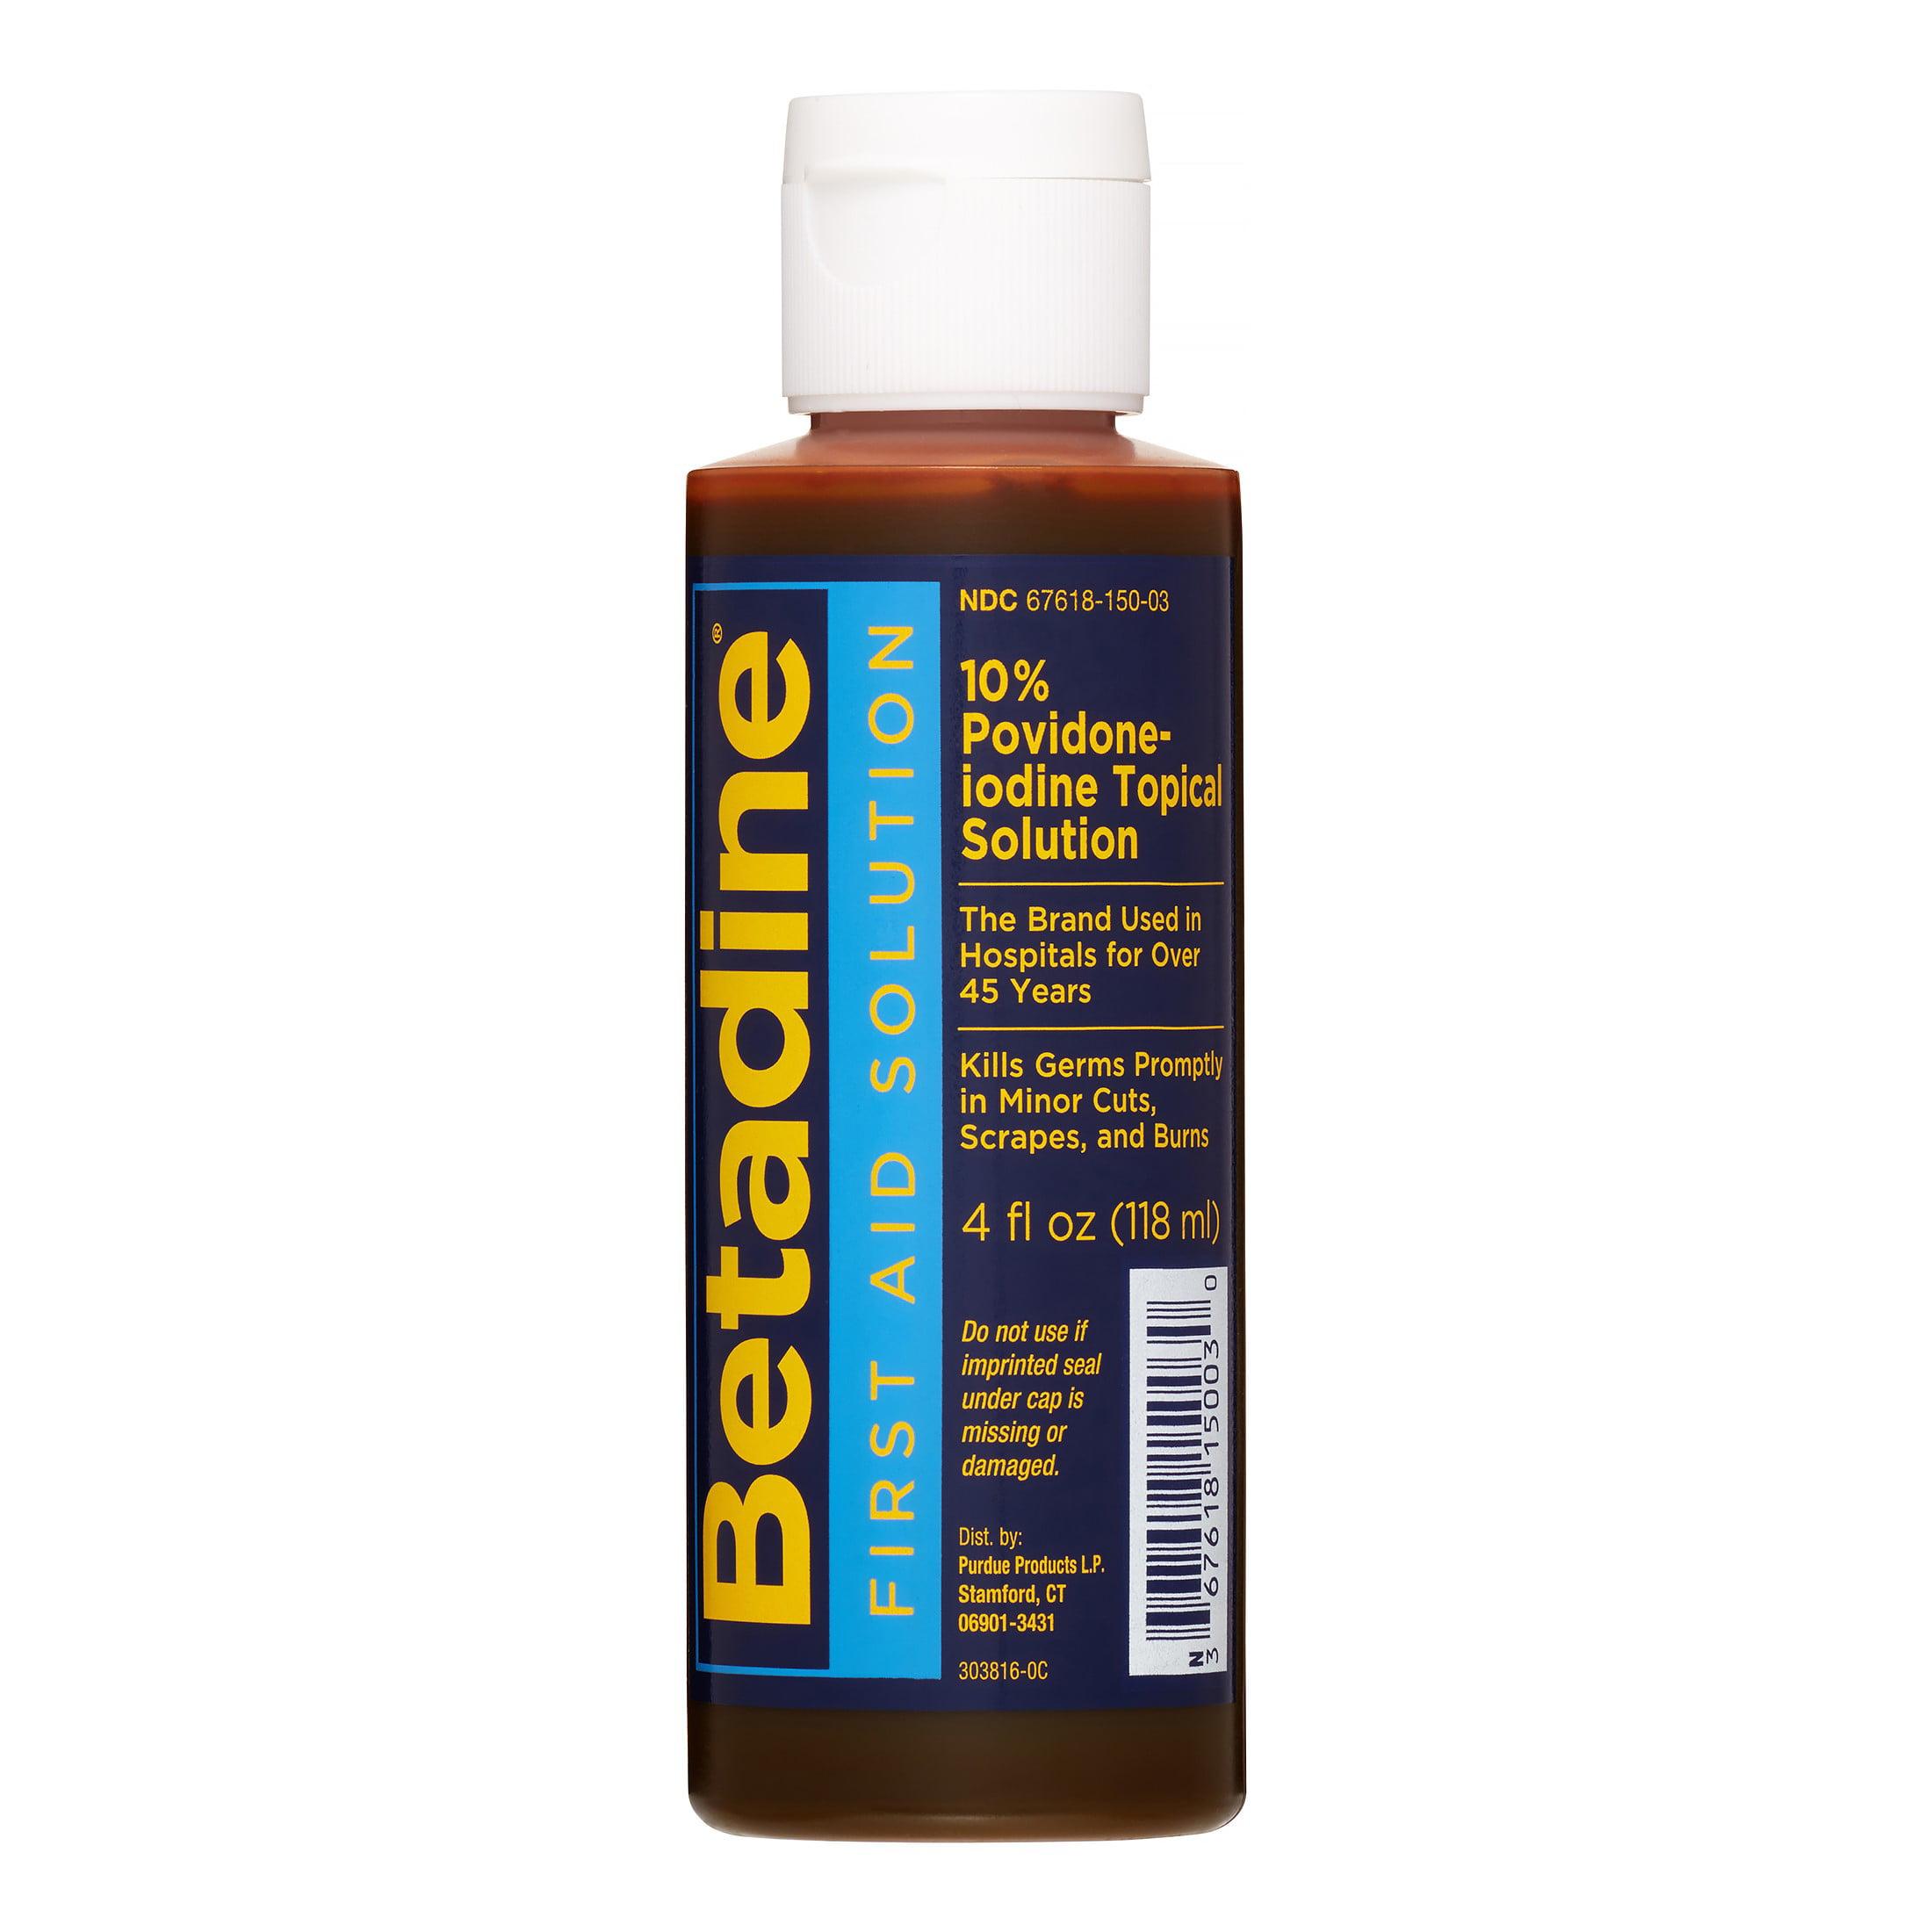 Betadine First Aid Solution, 4 Oz by Purdue Pharma